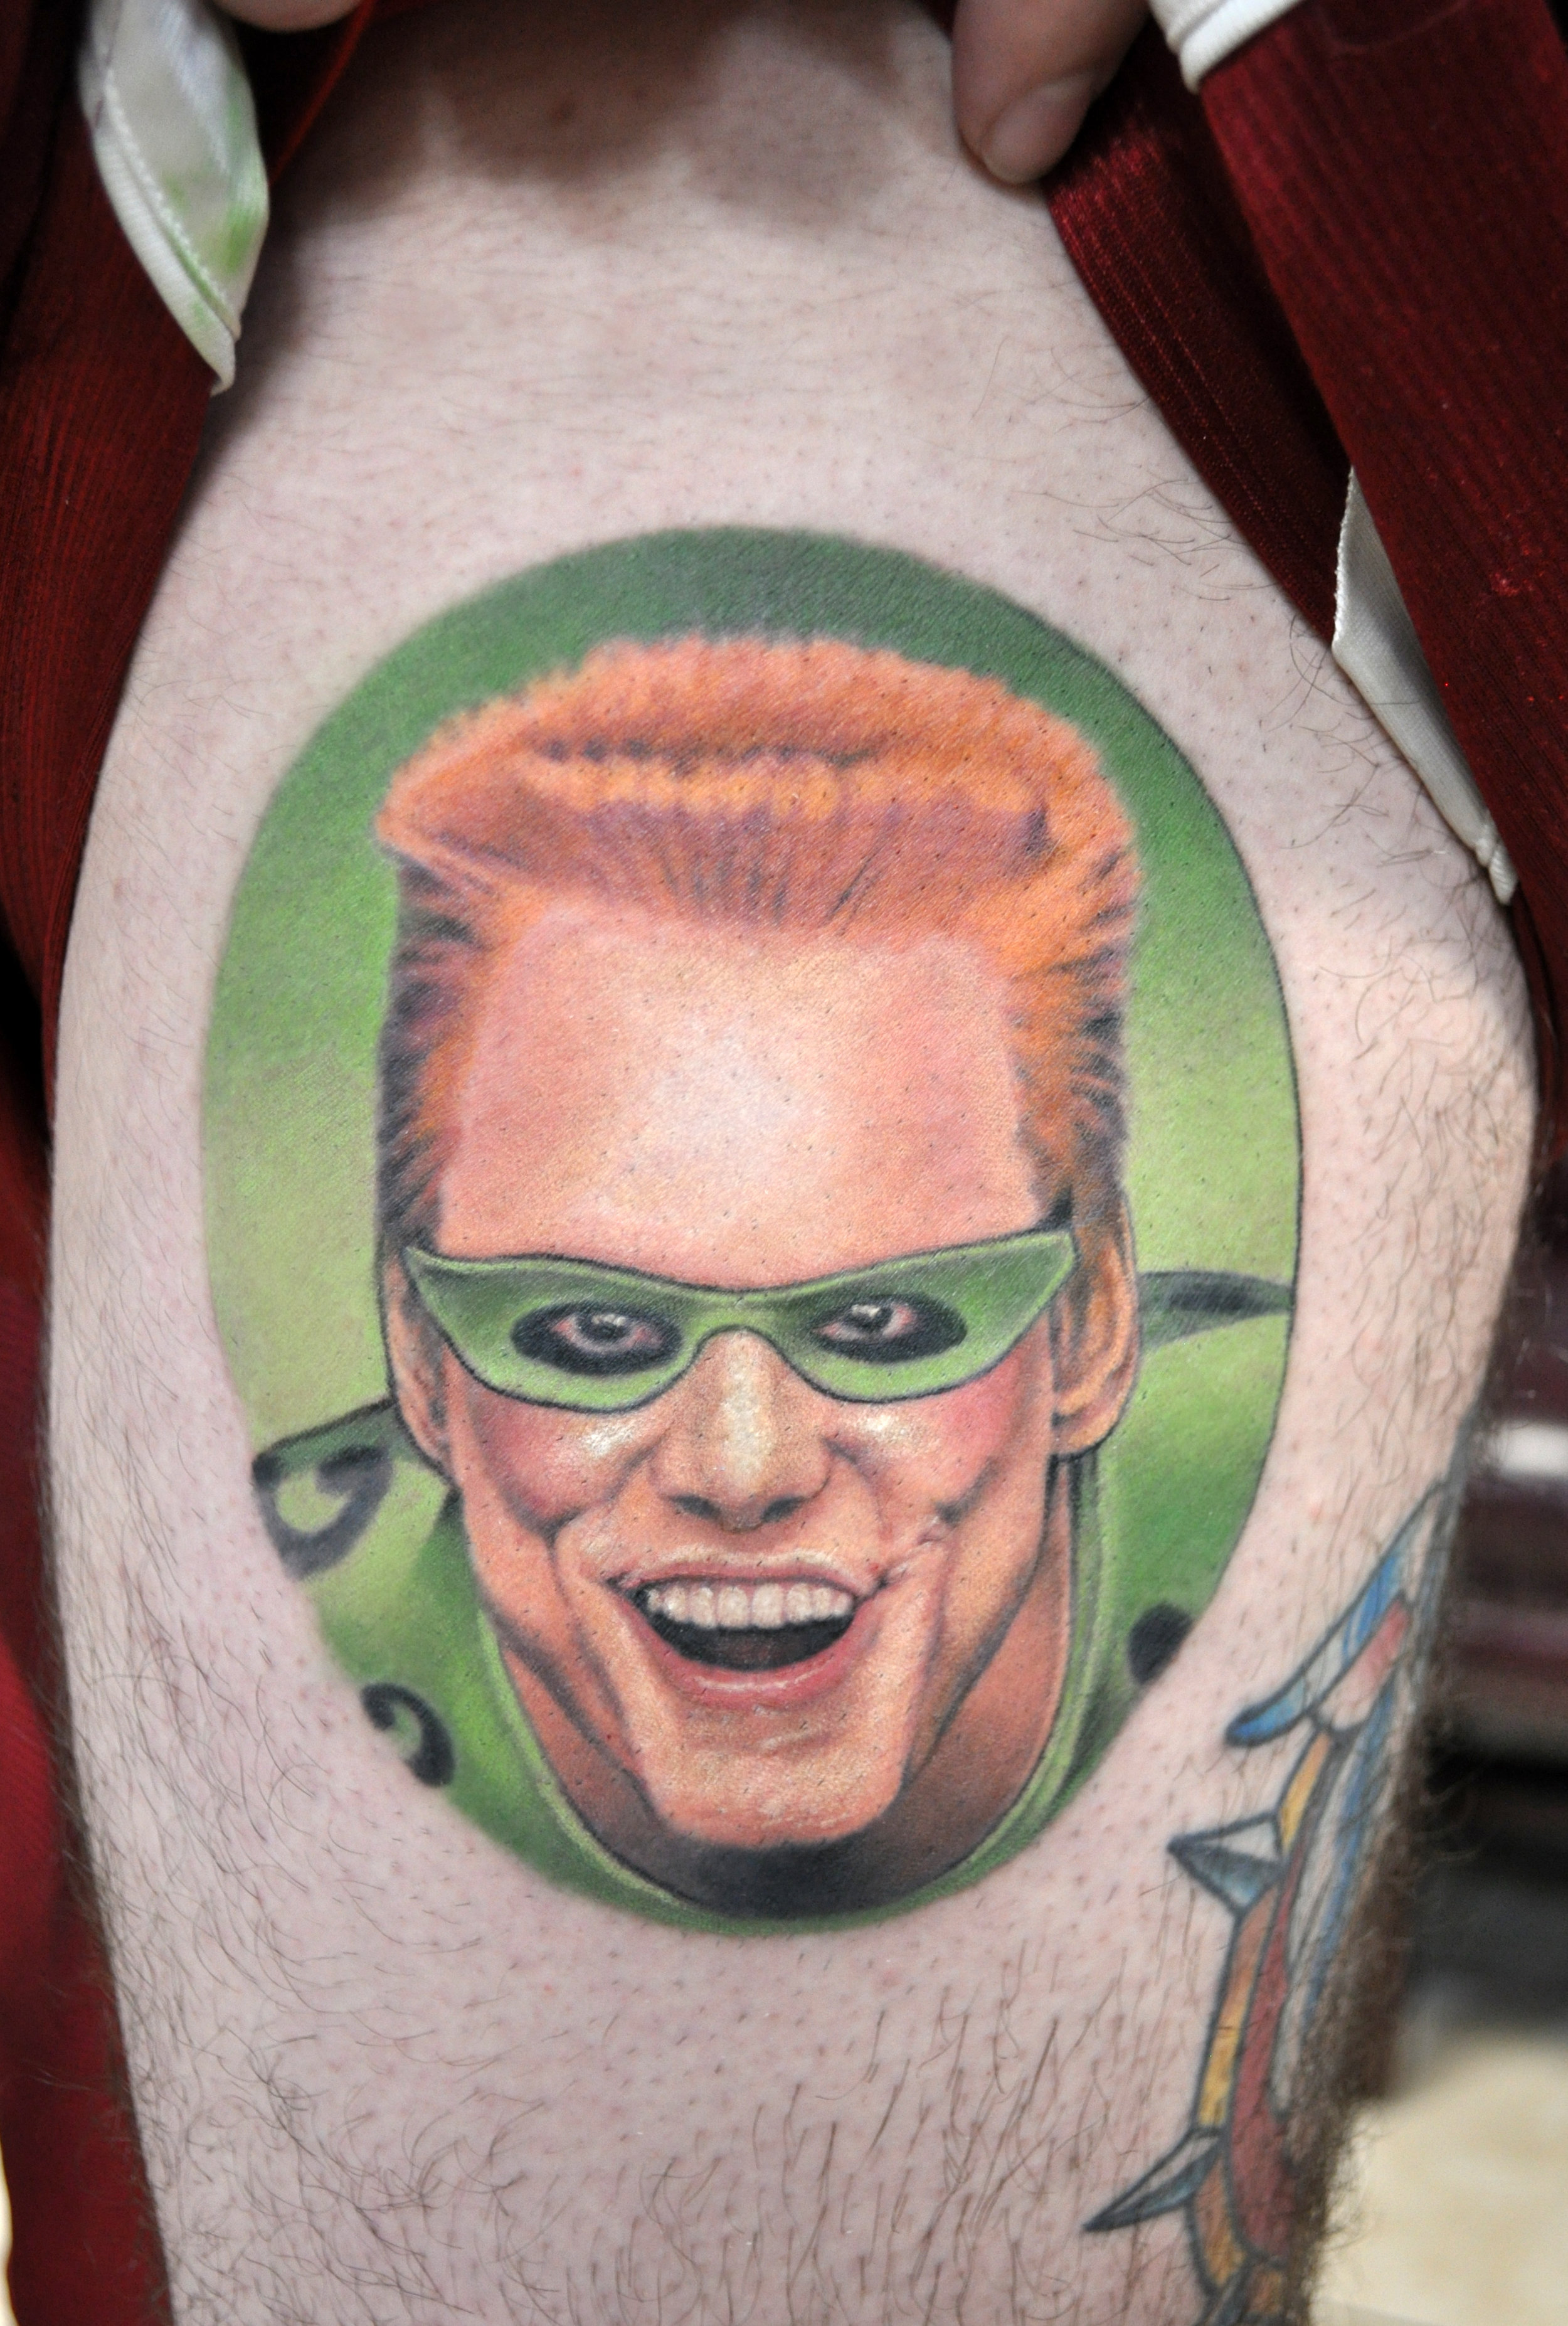 Jim Carey Tattoo Emily 2nd Portrait.jpg